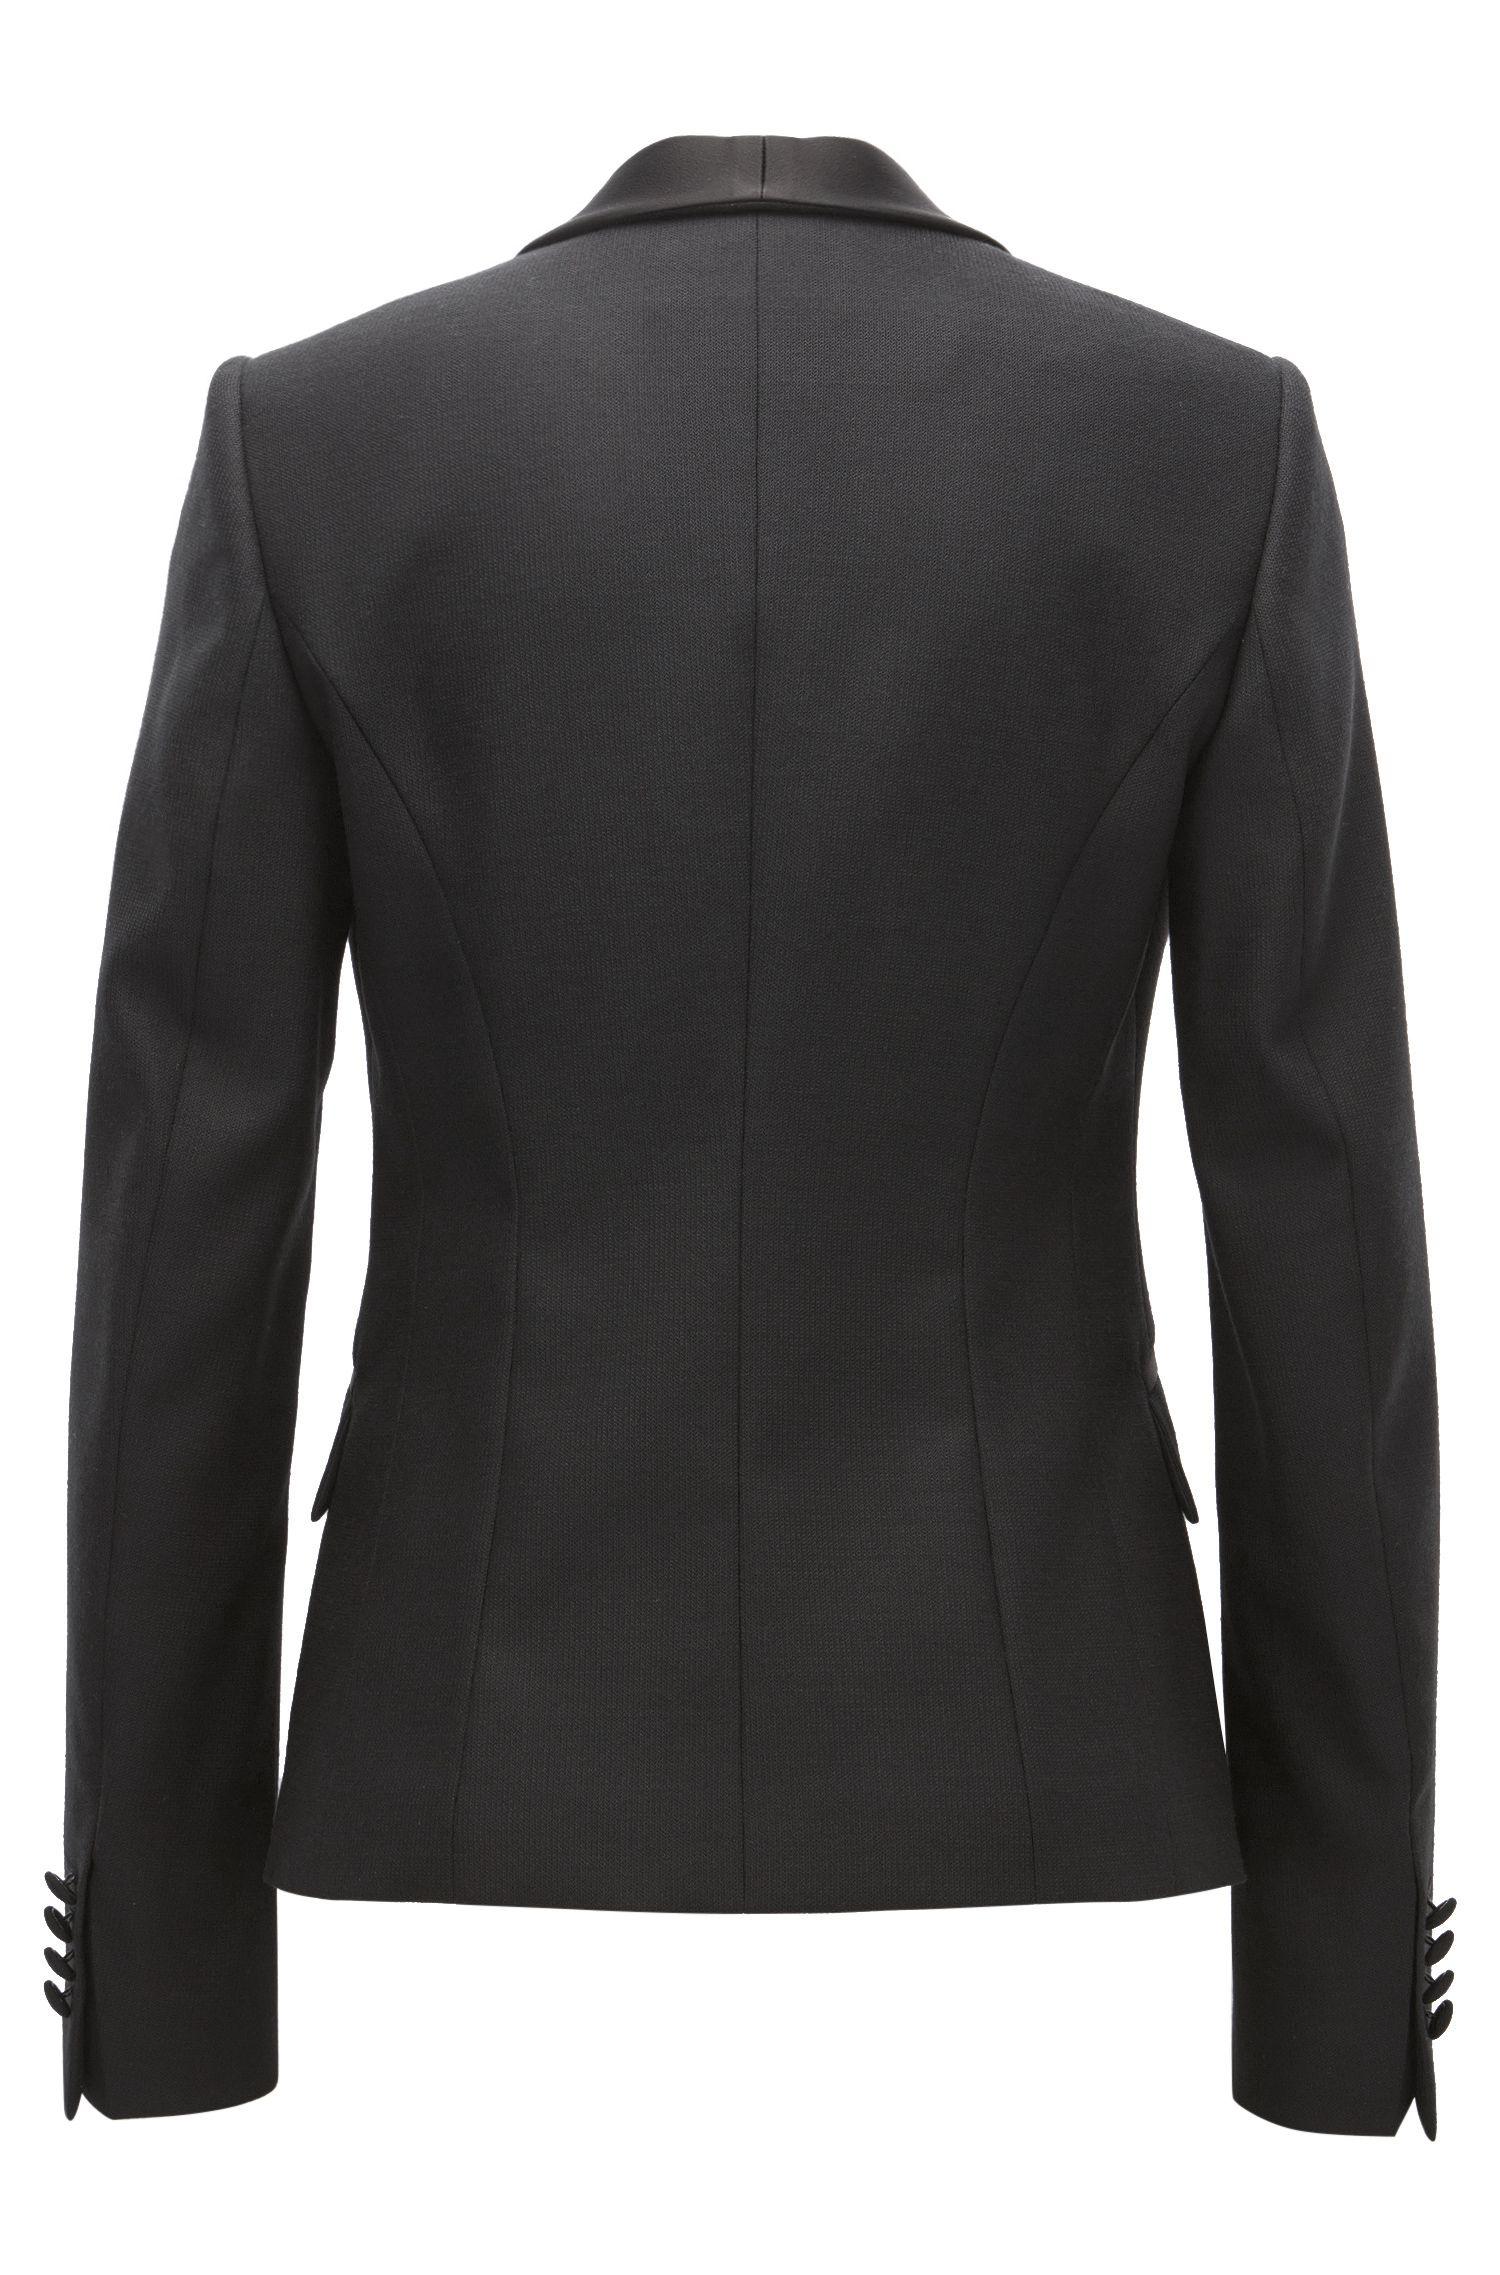 Virgin Wool Tuxedo Jacket | Jivuna, Black